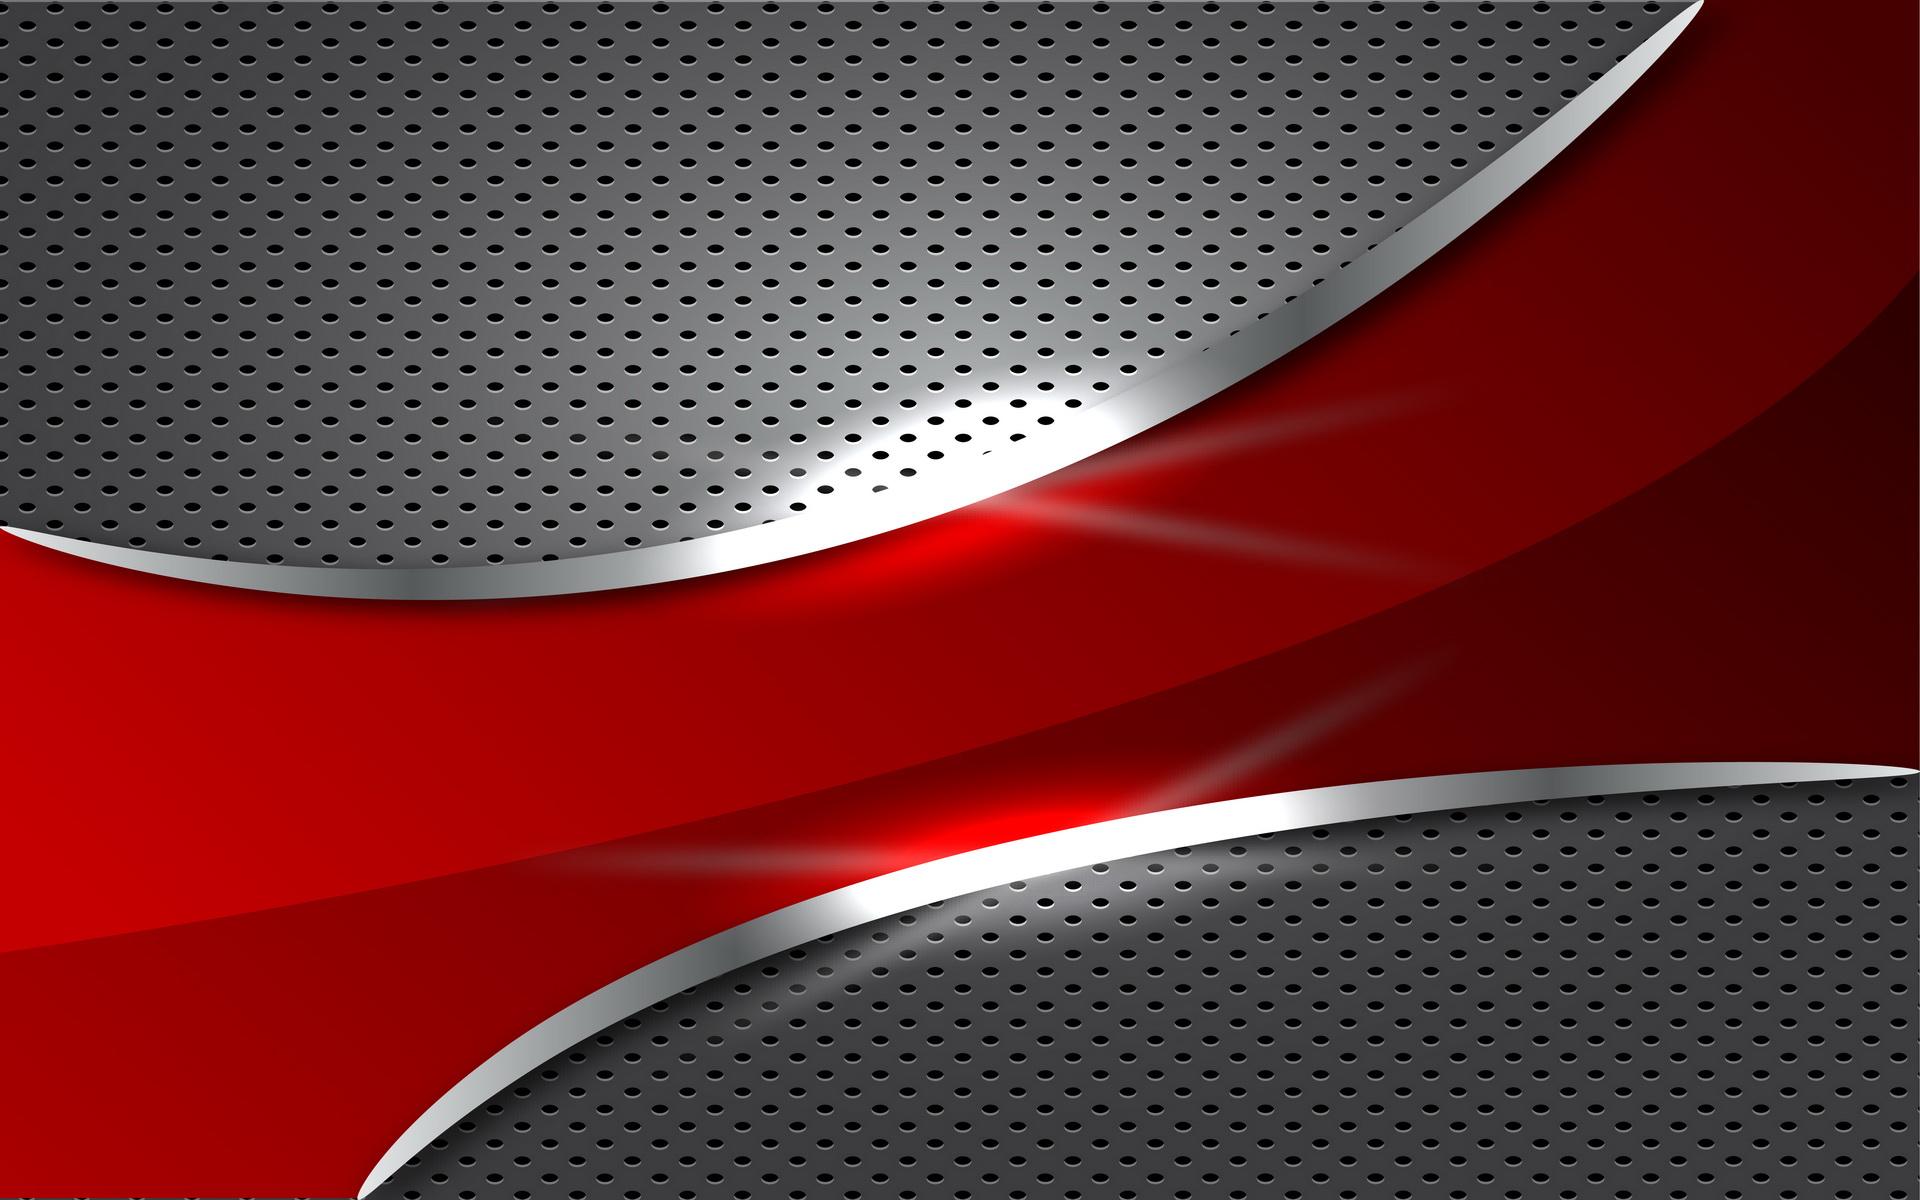 Red metal wallpaper